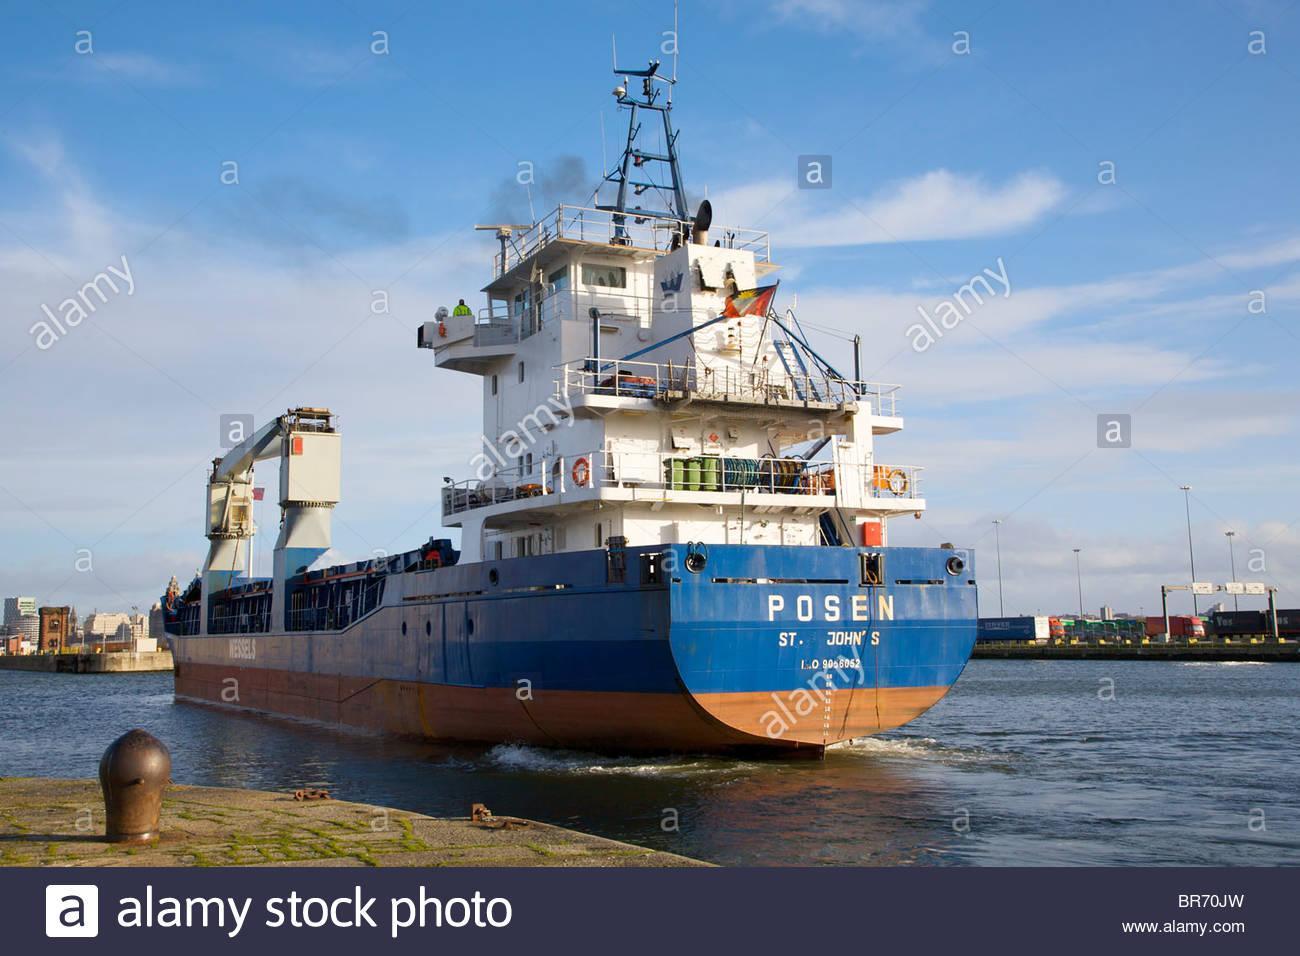 Cargo vessel 'Posen', built in 1993, leaving Birkenhead dock system, Merseyside, UK. February 2009. - Stock Image